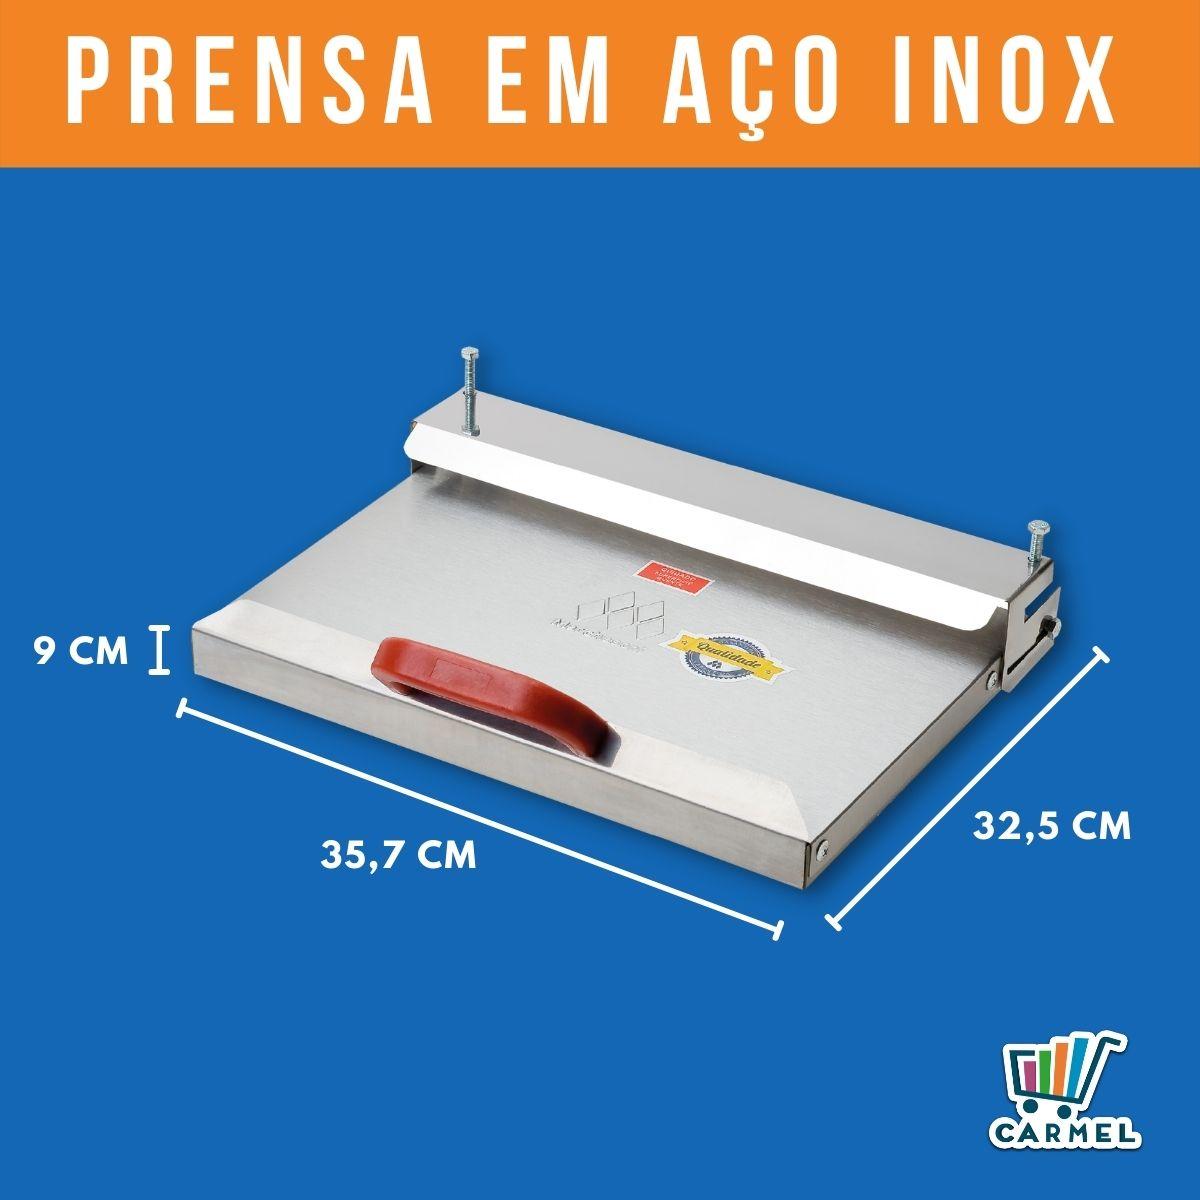 Prensa Chapa 30X40 Marchesoni  - Carmel Equipamentos